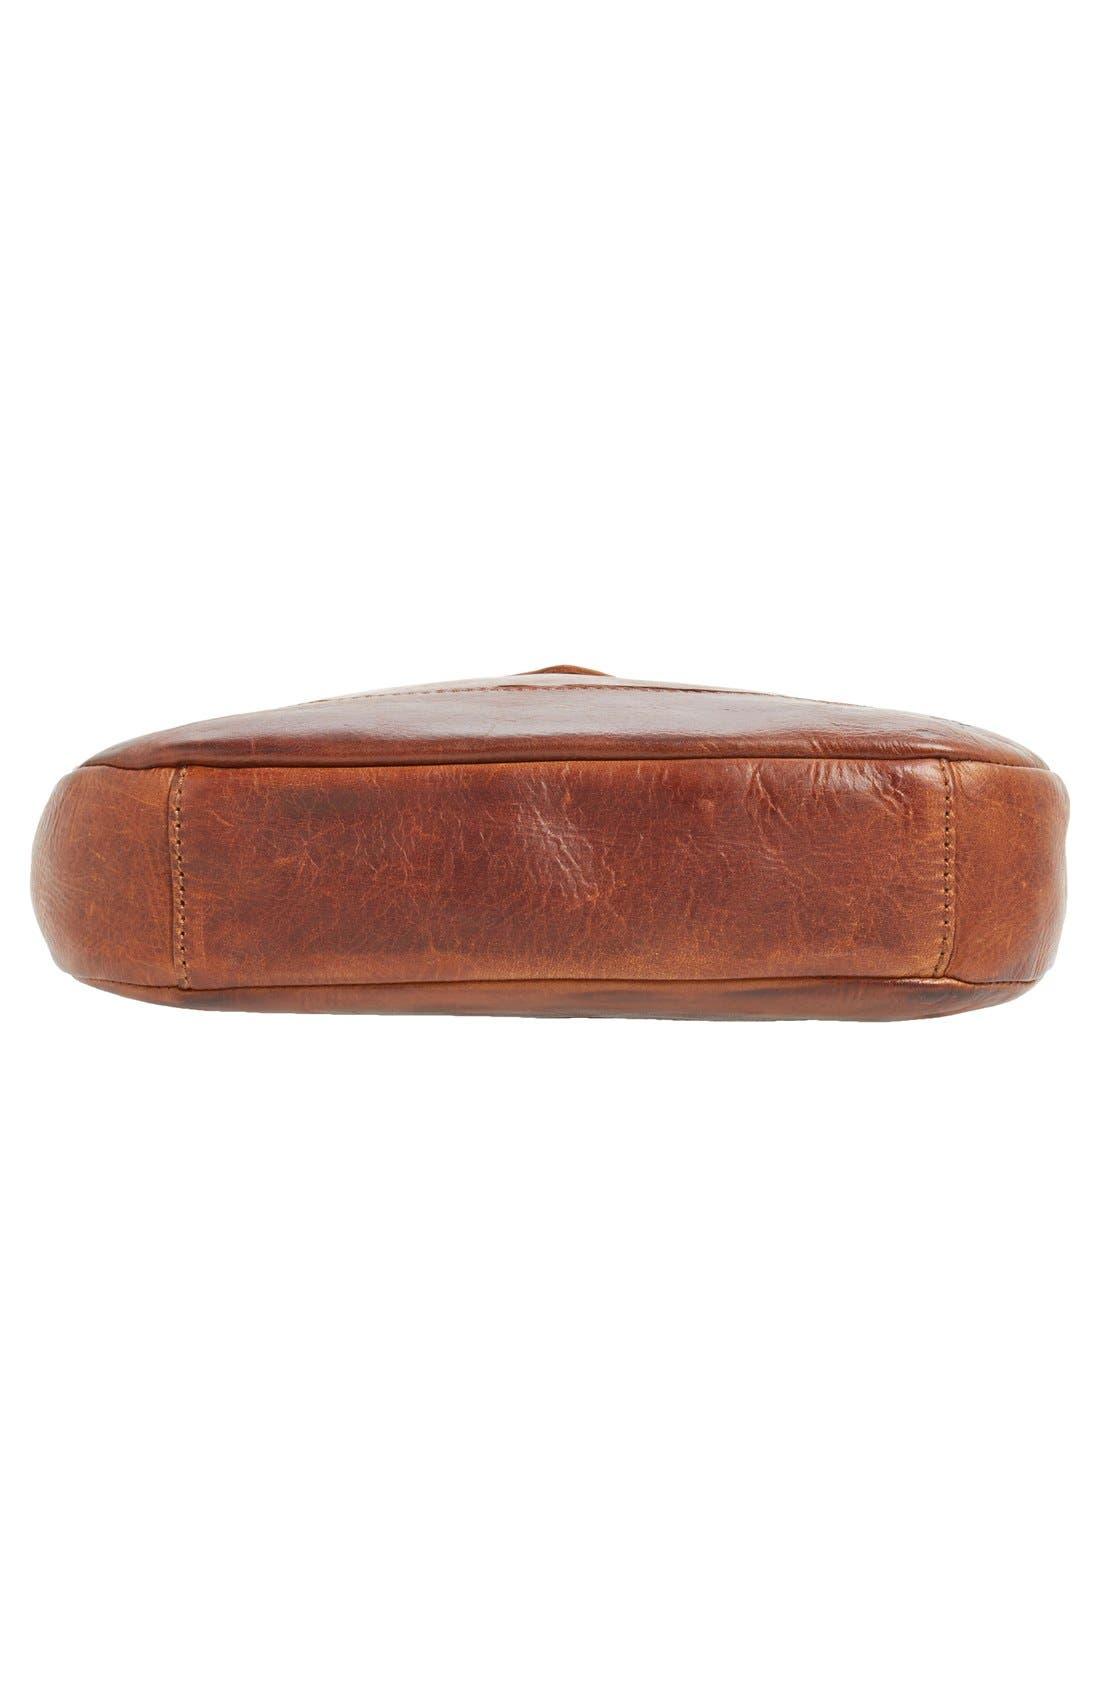 Melissa Button Crossbody Bag,                             Alternate thumbnail 6, color,                             Cognac